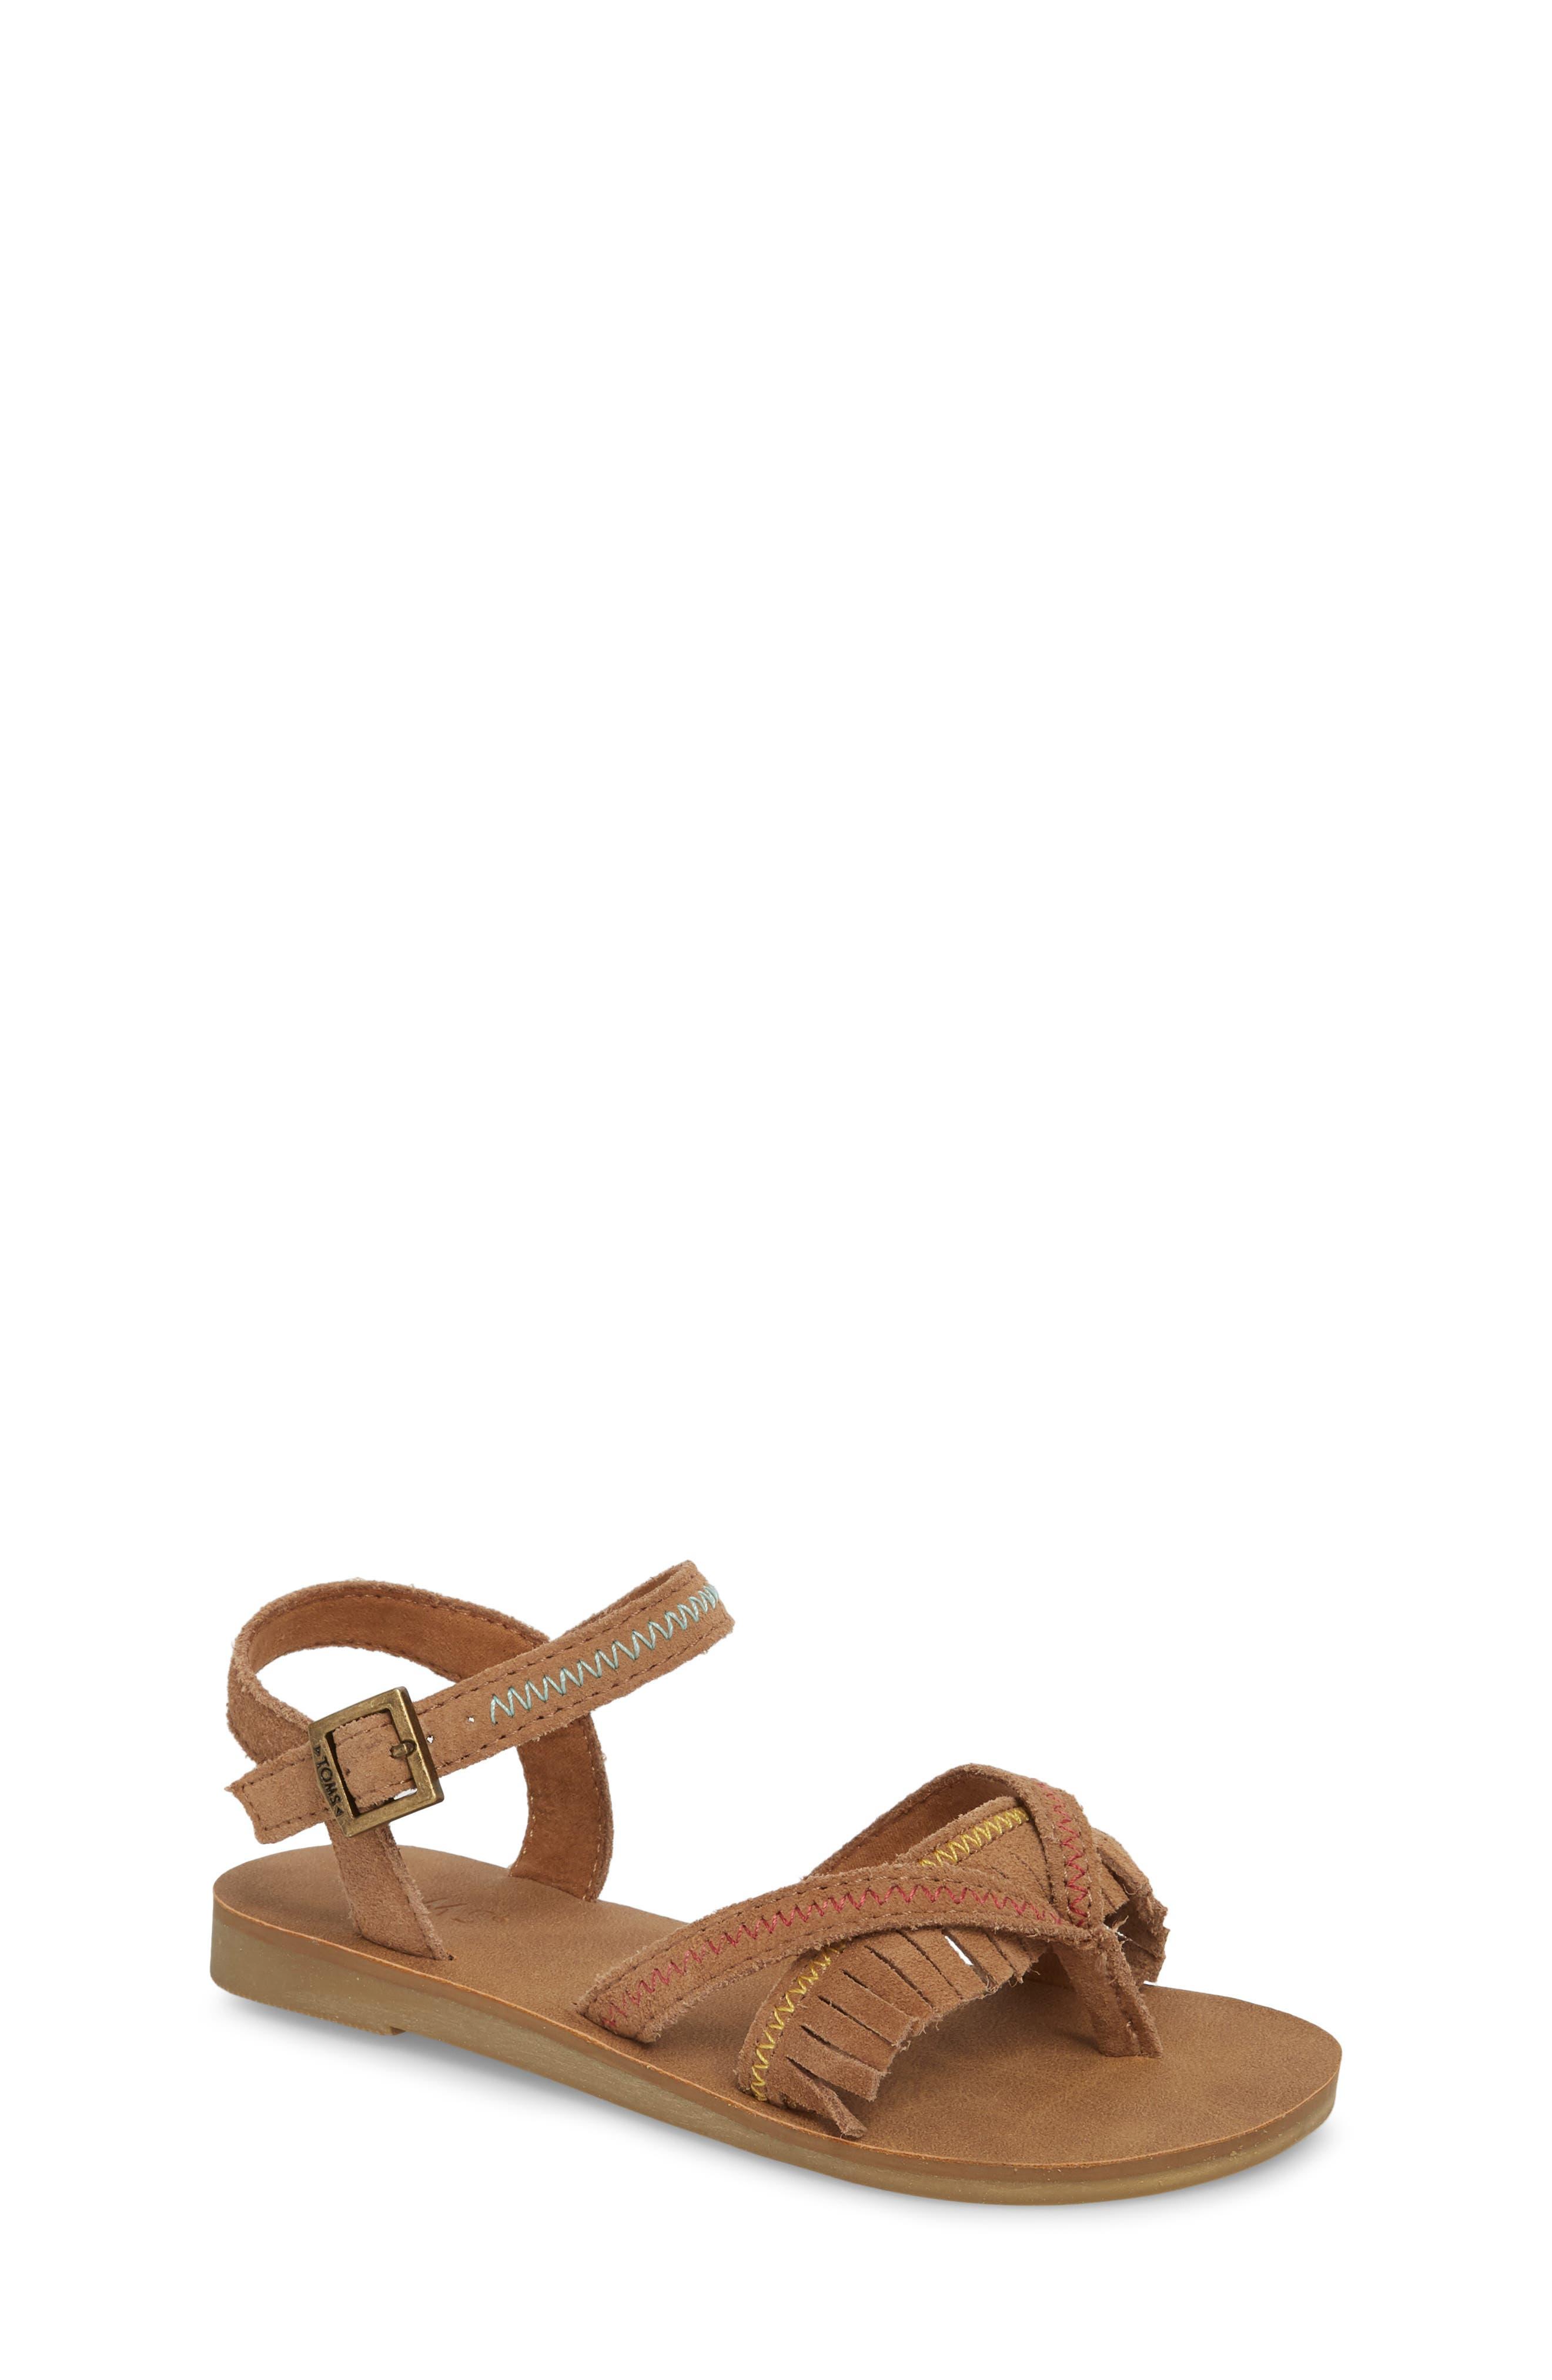 Lexie Fringe Sandal,                         Main,                         color,